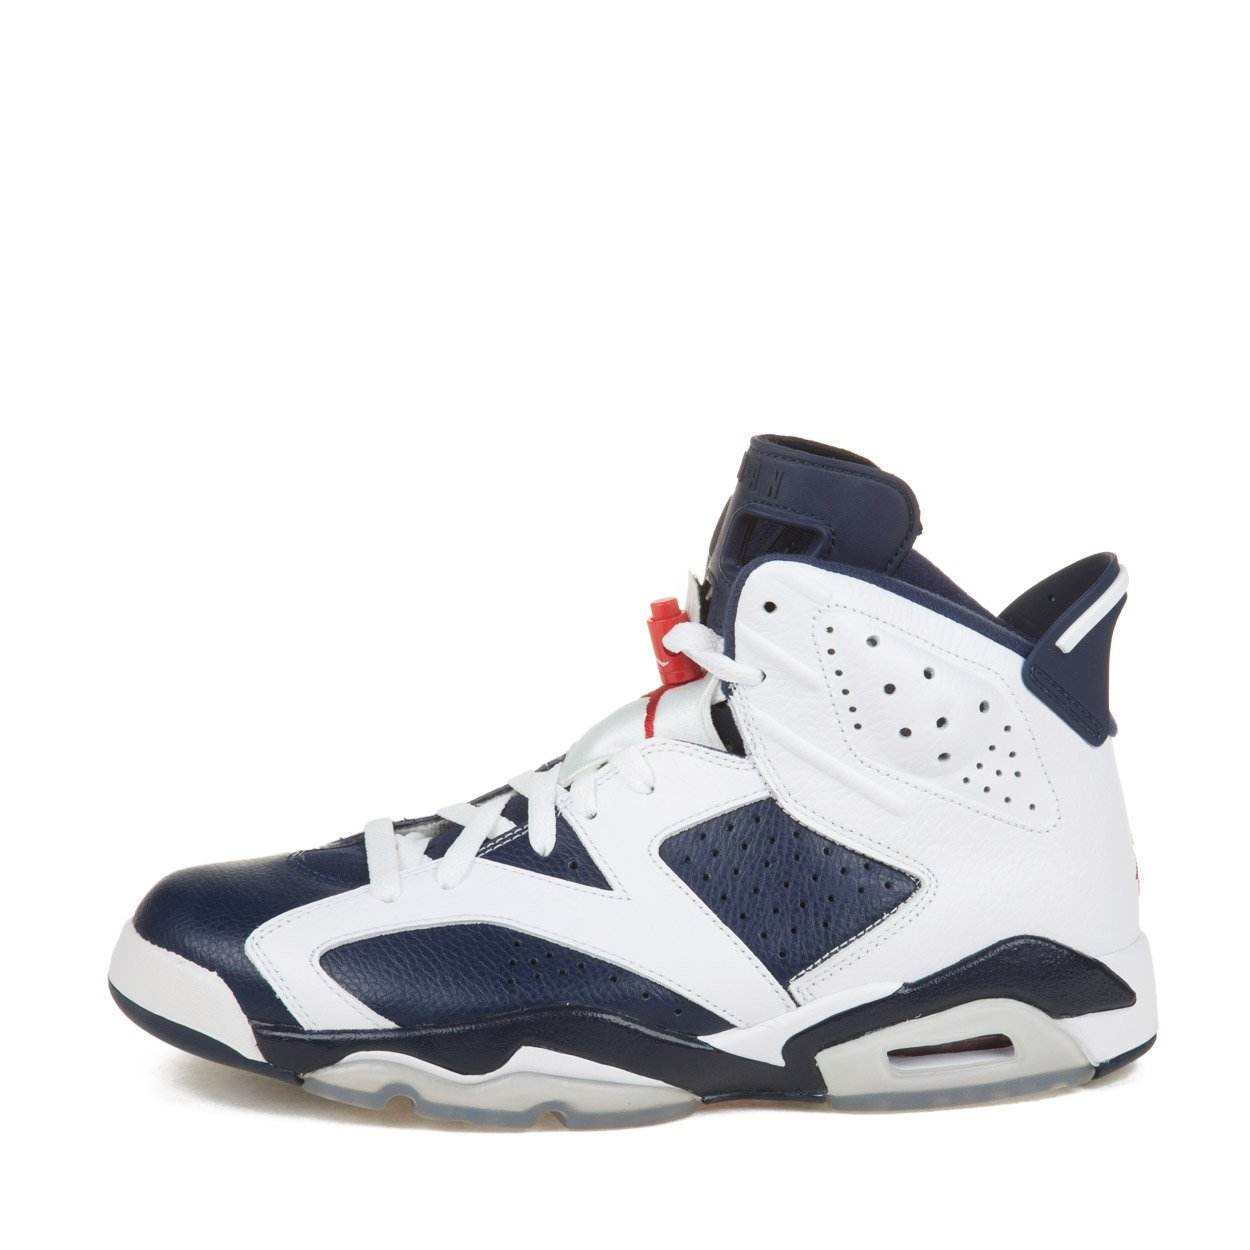 5665525b45b Galleon - Nike Mens Air Jordan 6 Retro